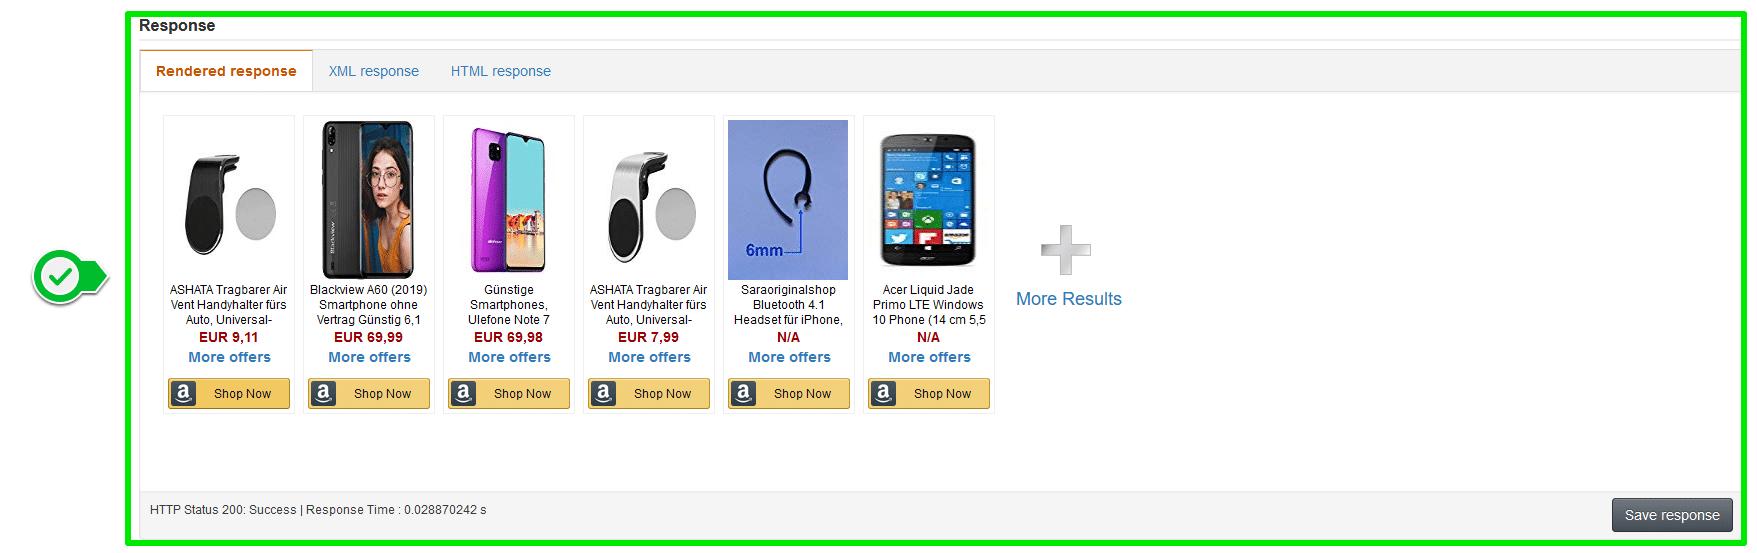 Amazon AWS Scratchpad - Response